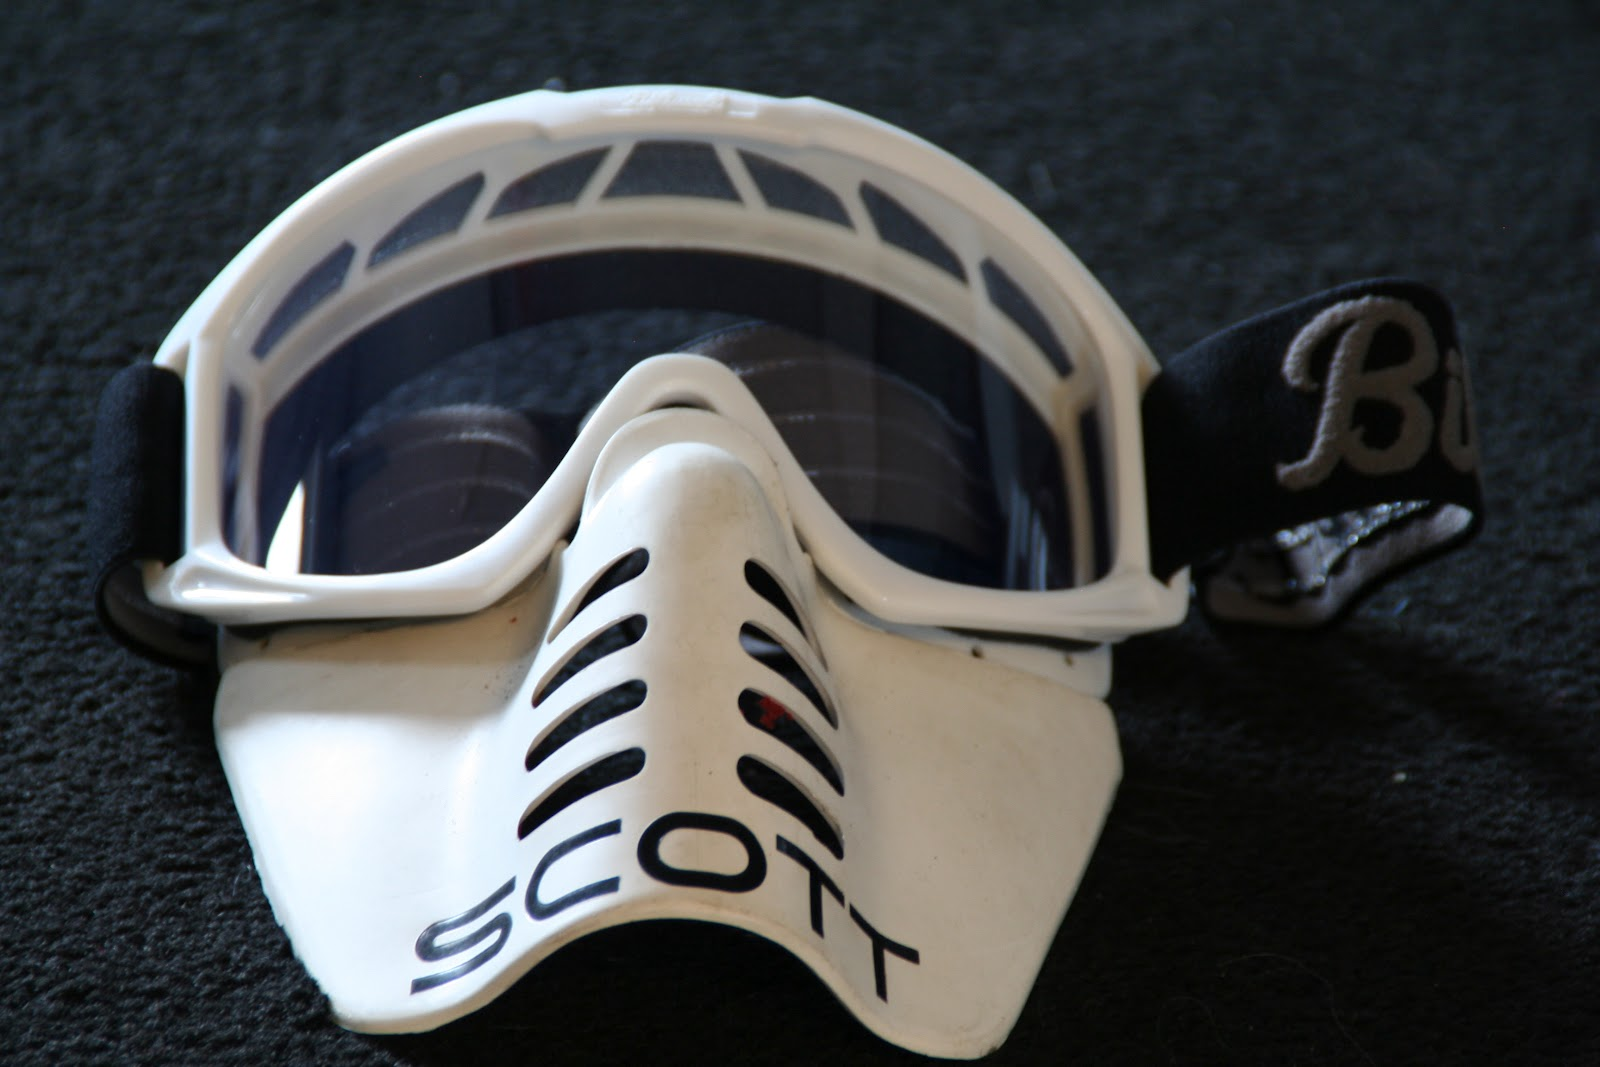 bdc87f403f1 Oakley Face Mask « Heritage Malta